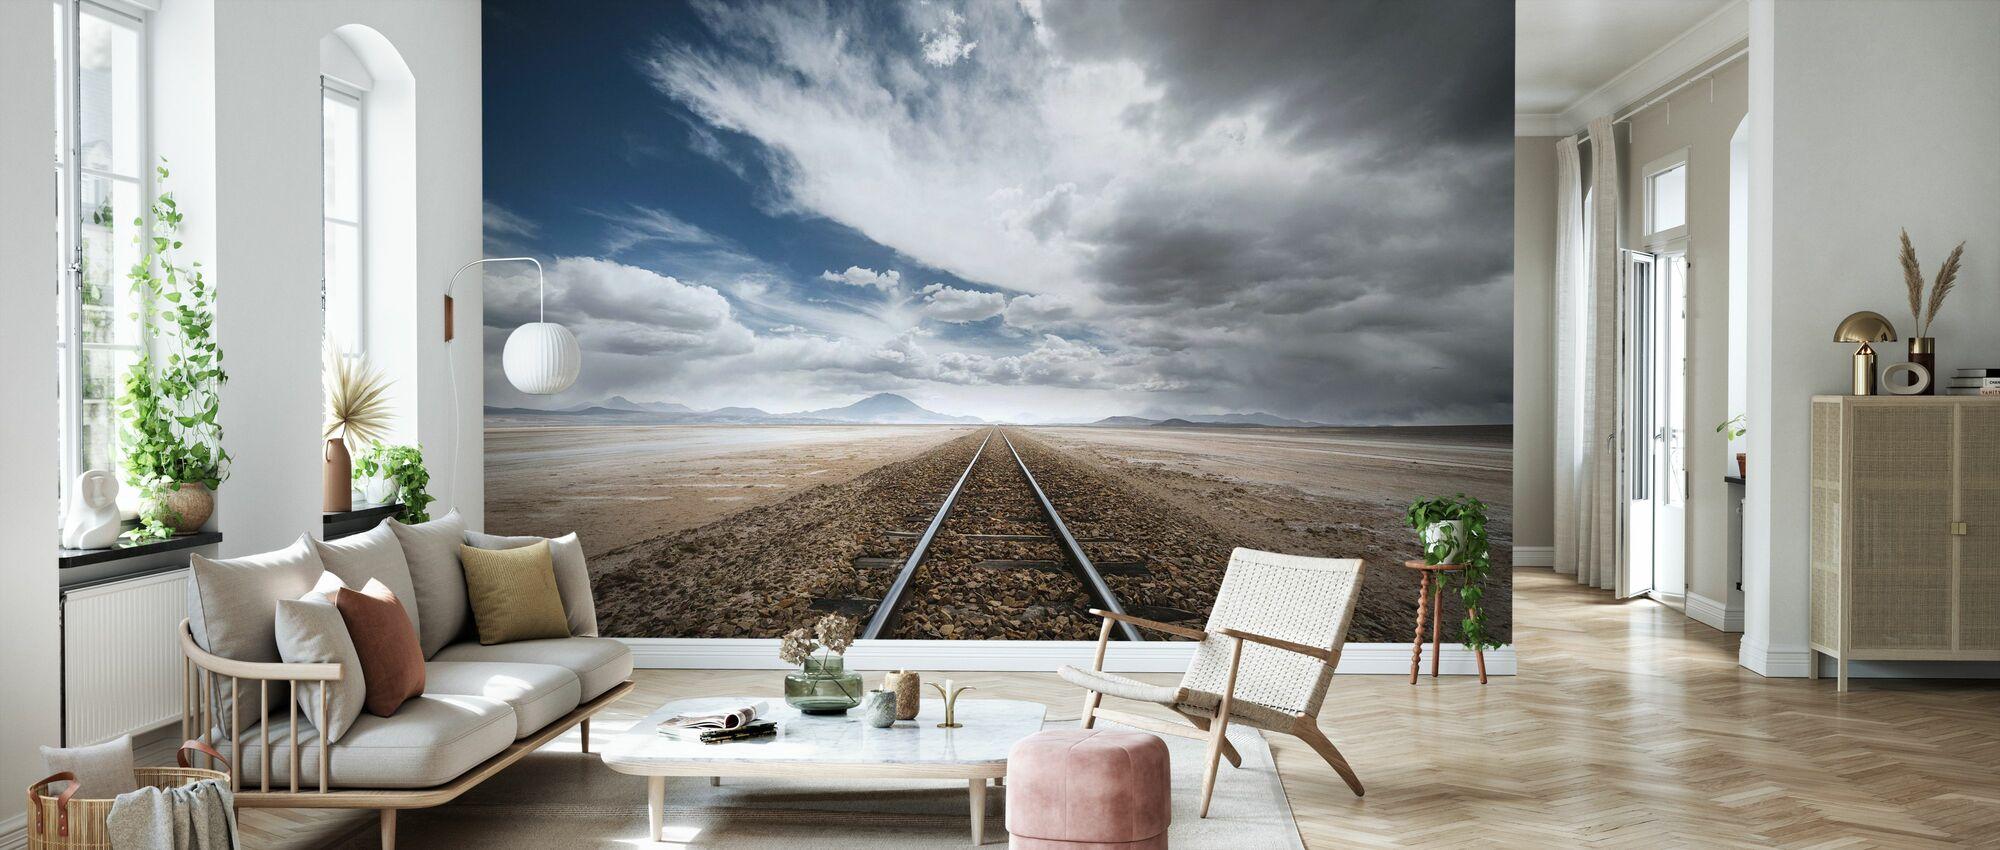 Long Road - Wallpaper - Living Room